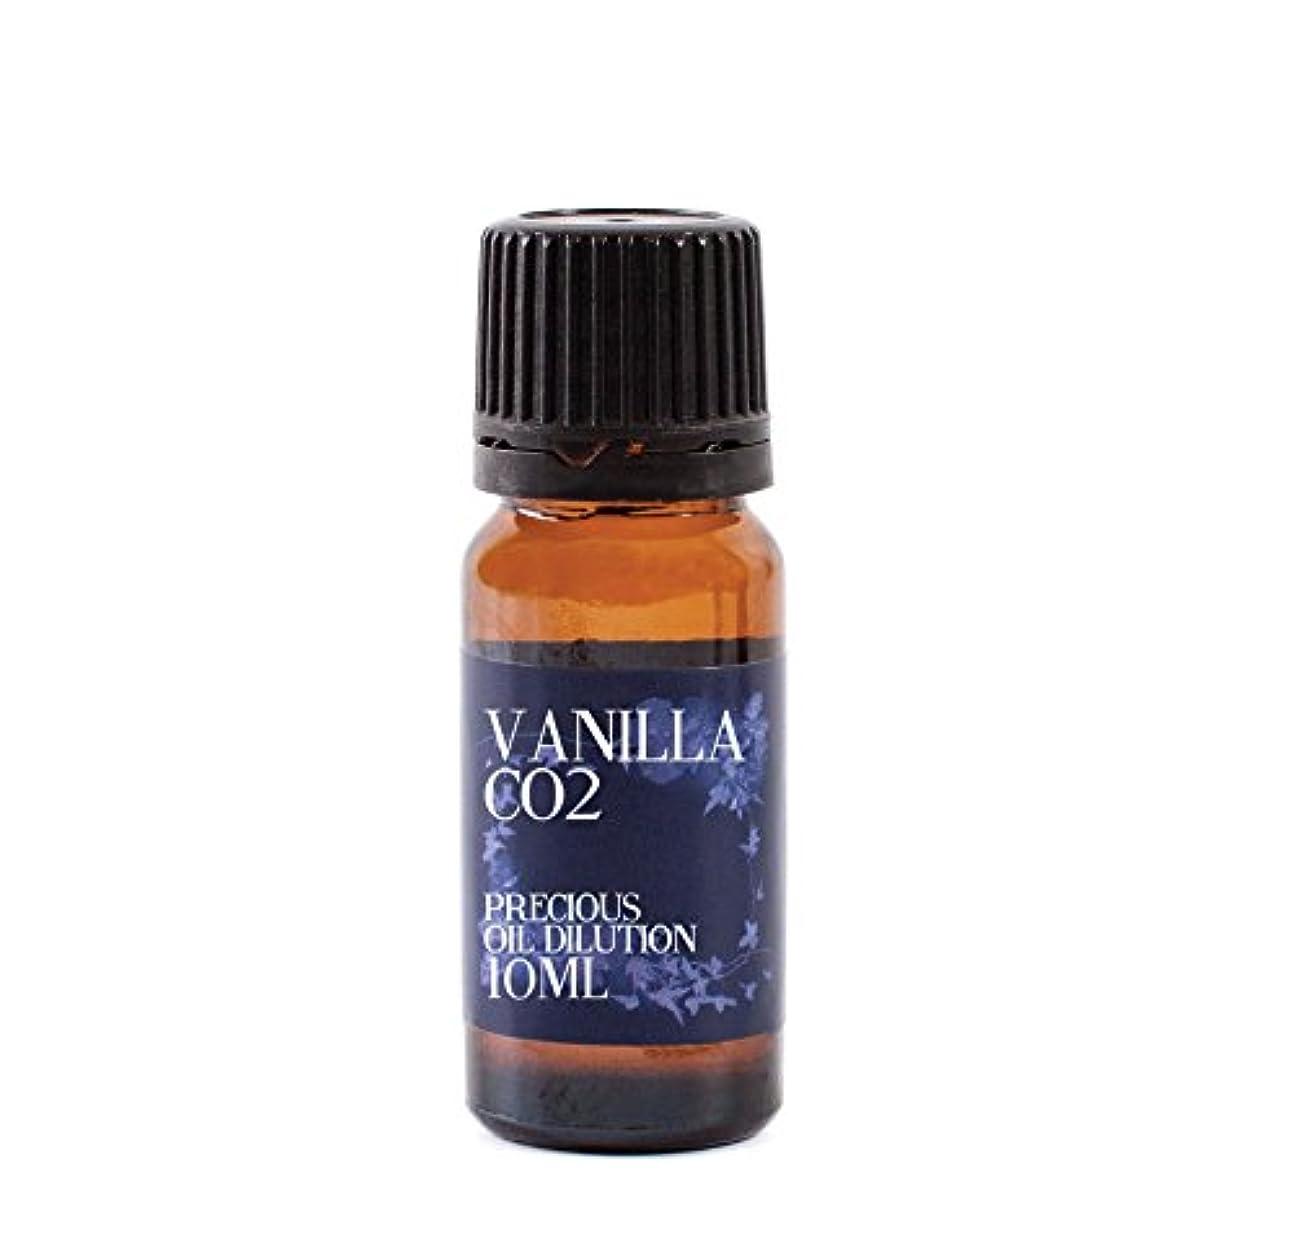 Mystic Moments | Vanilla CO2 Essential Oil Dilution - 10ml - 3% Jojoba Blend